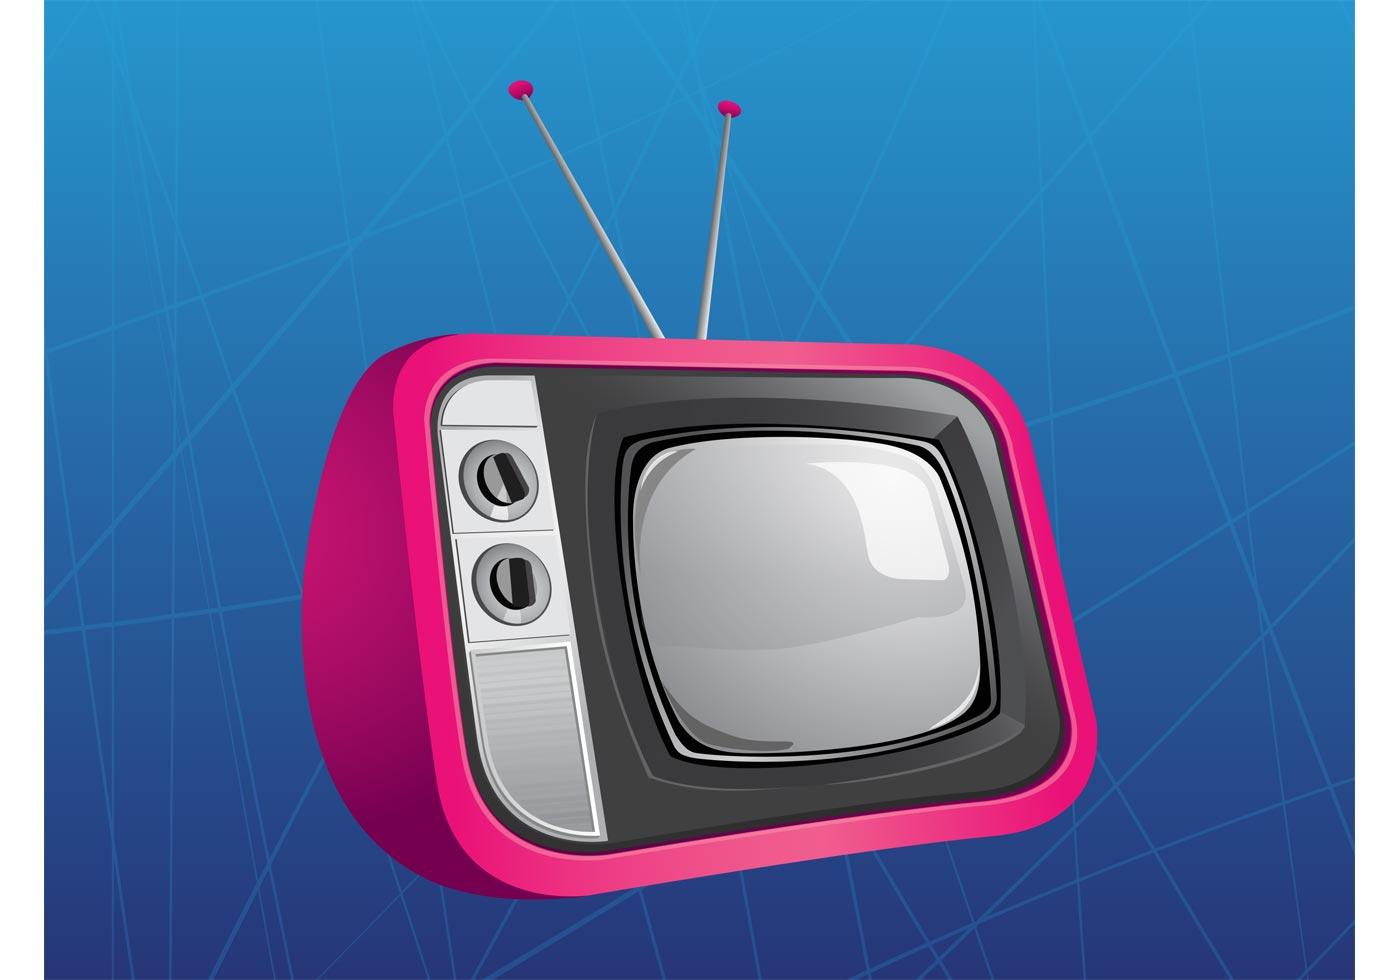 Retro TV Vector - Download Free Vector Art, Stock Graphics ...